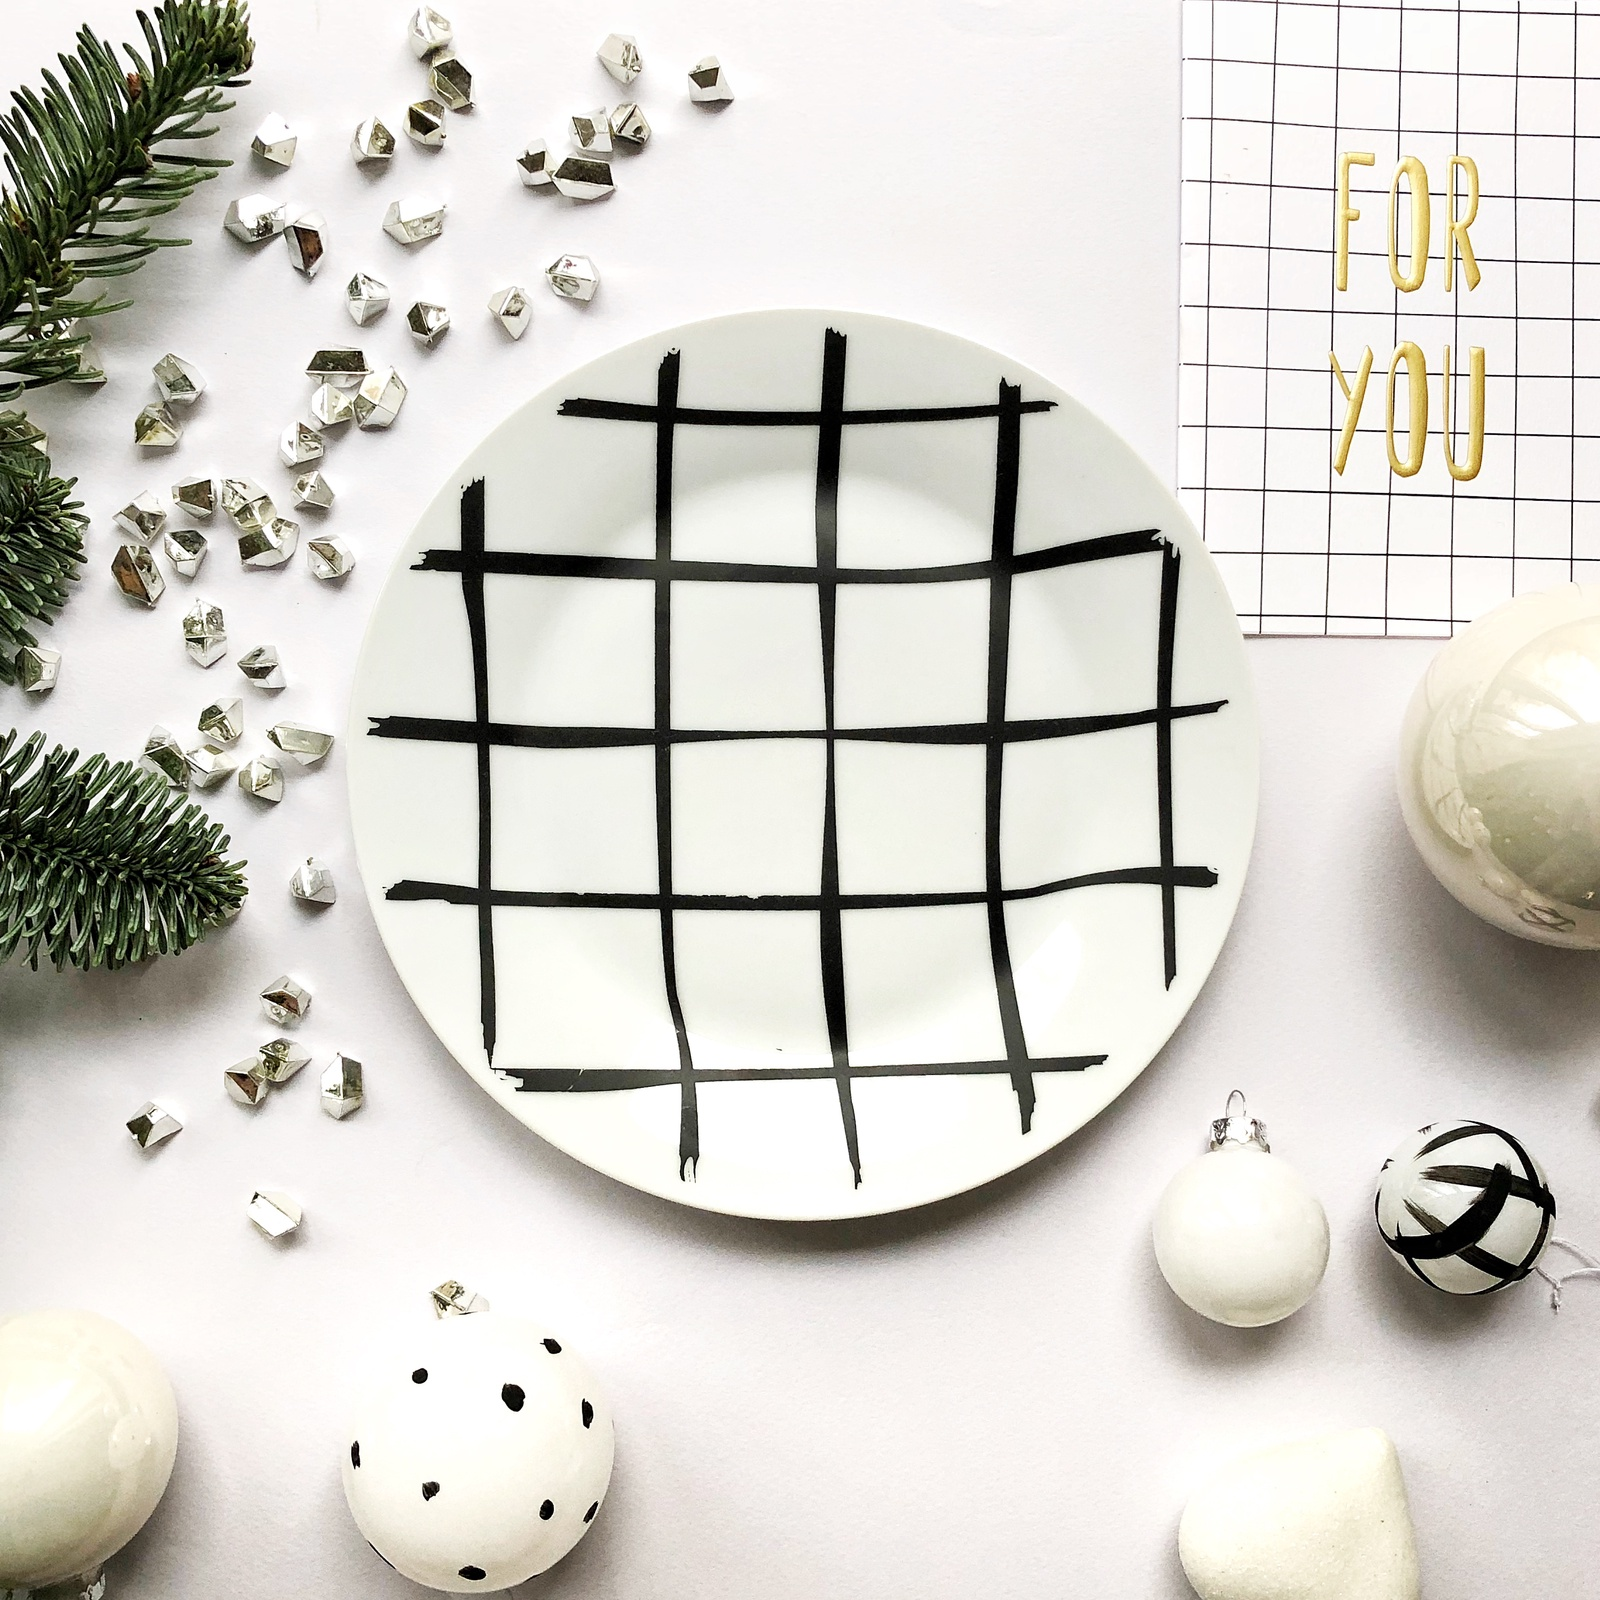 Тарелка Сотвори Чудо Клетка 20 см, белый тарелка мелкая сотвори чудо бантик sans brides диаметр 20 см